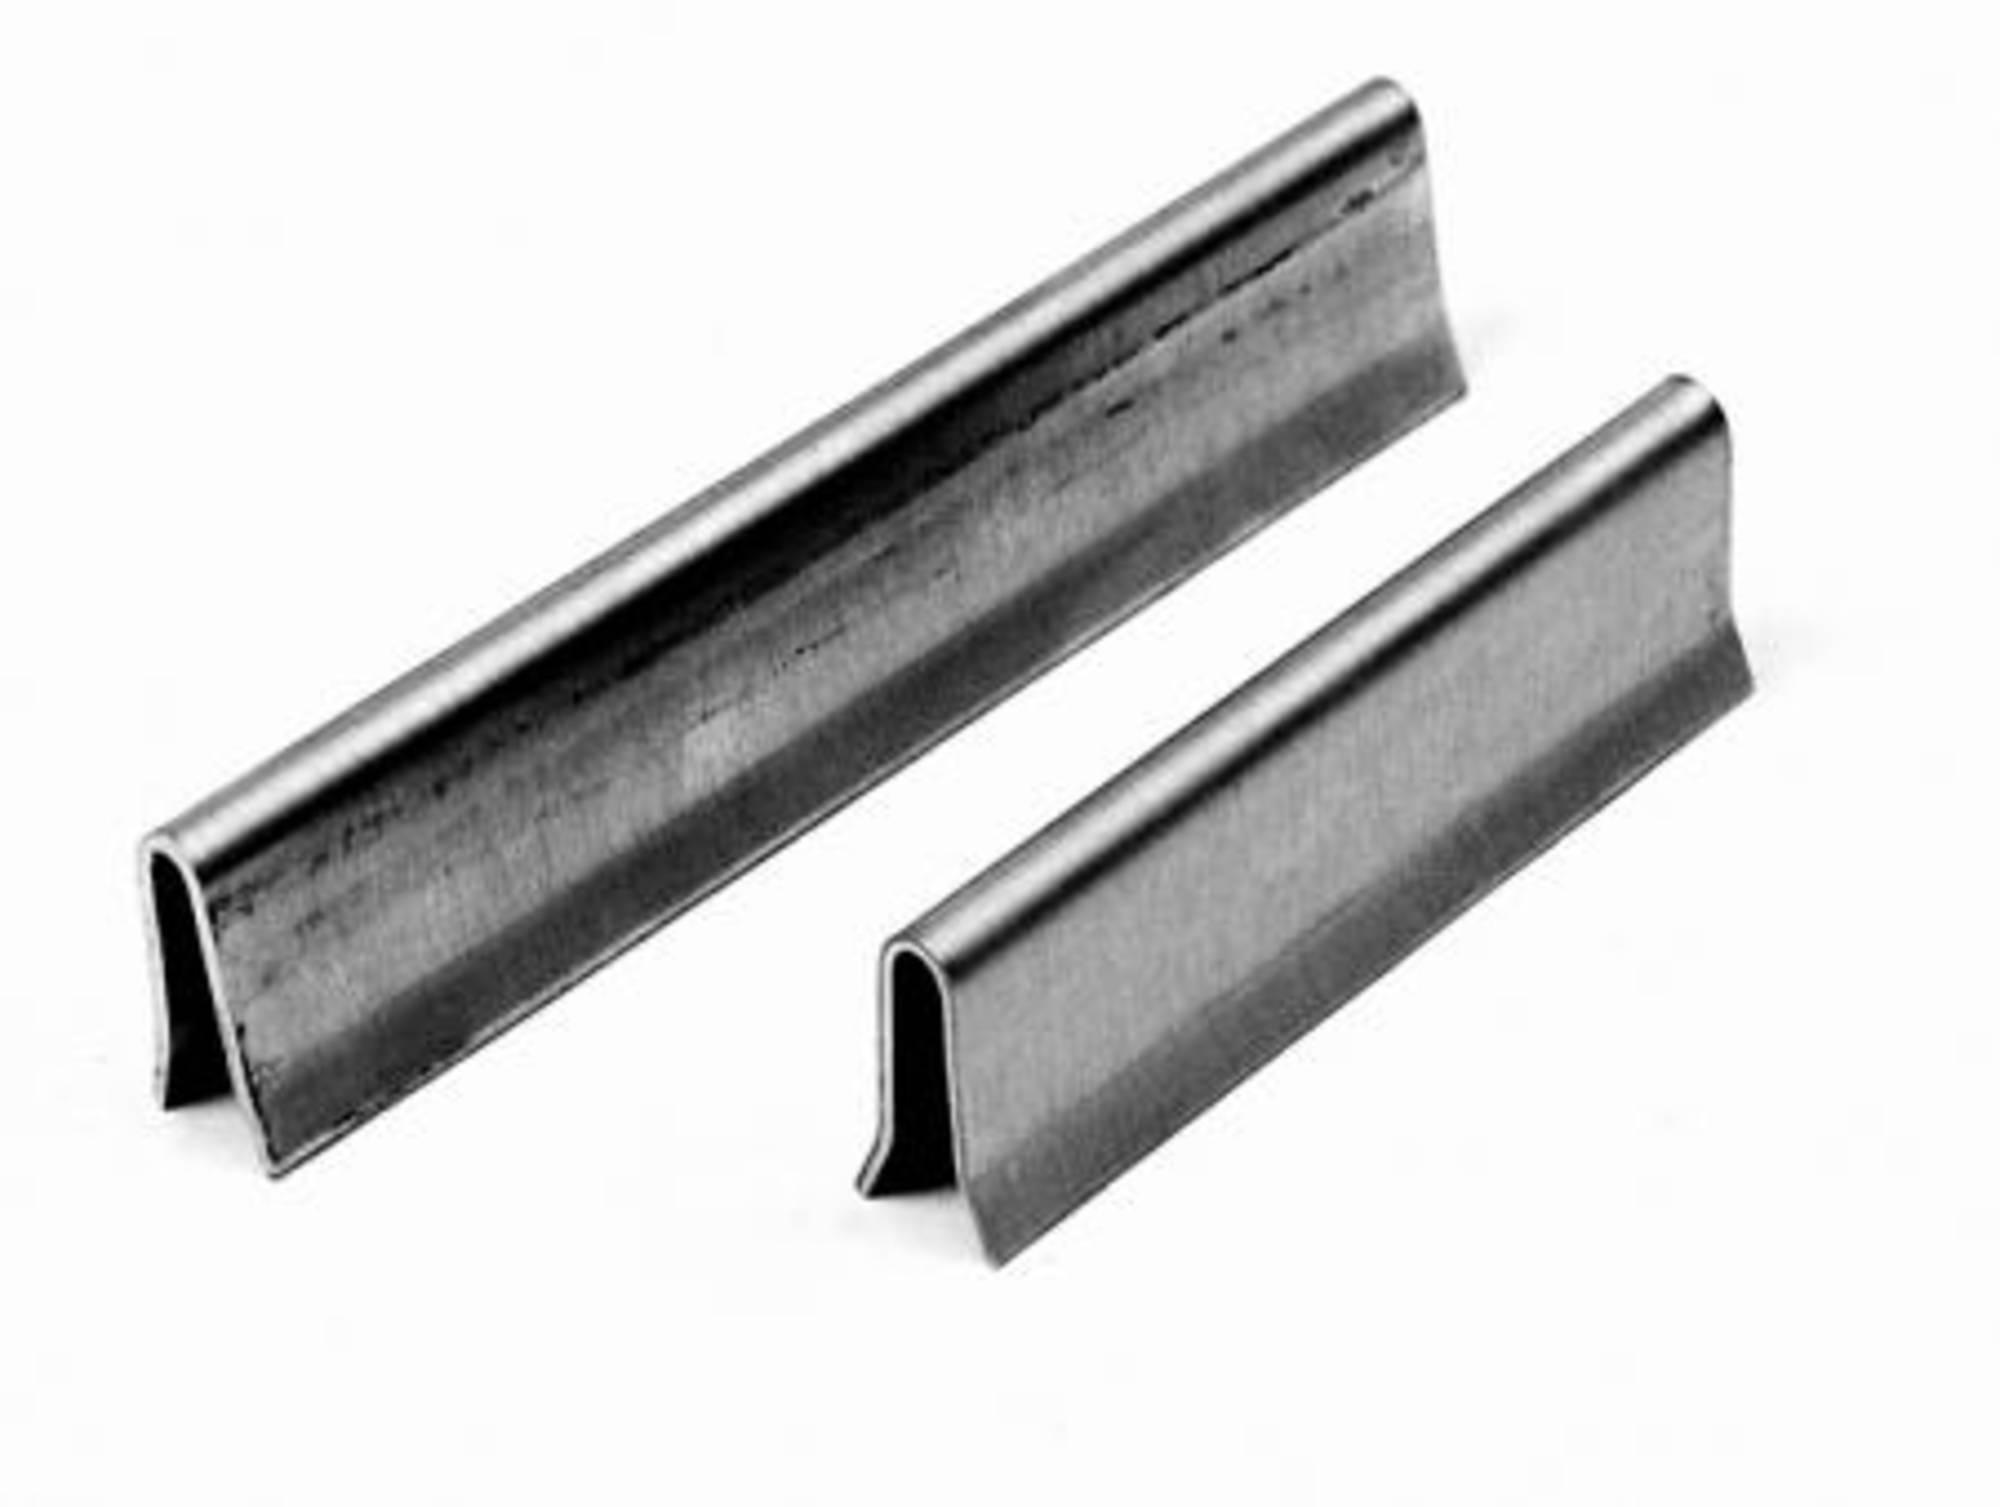 EASYDRAIN fixt-multi-tegel verbindings-koppel clip v-drain RVS (EDFTCLIP)